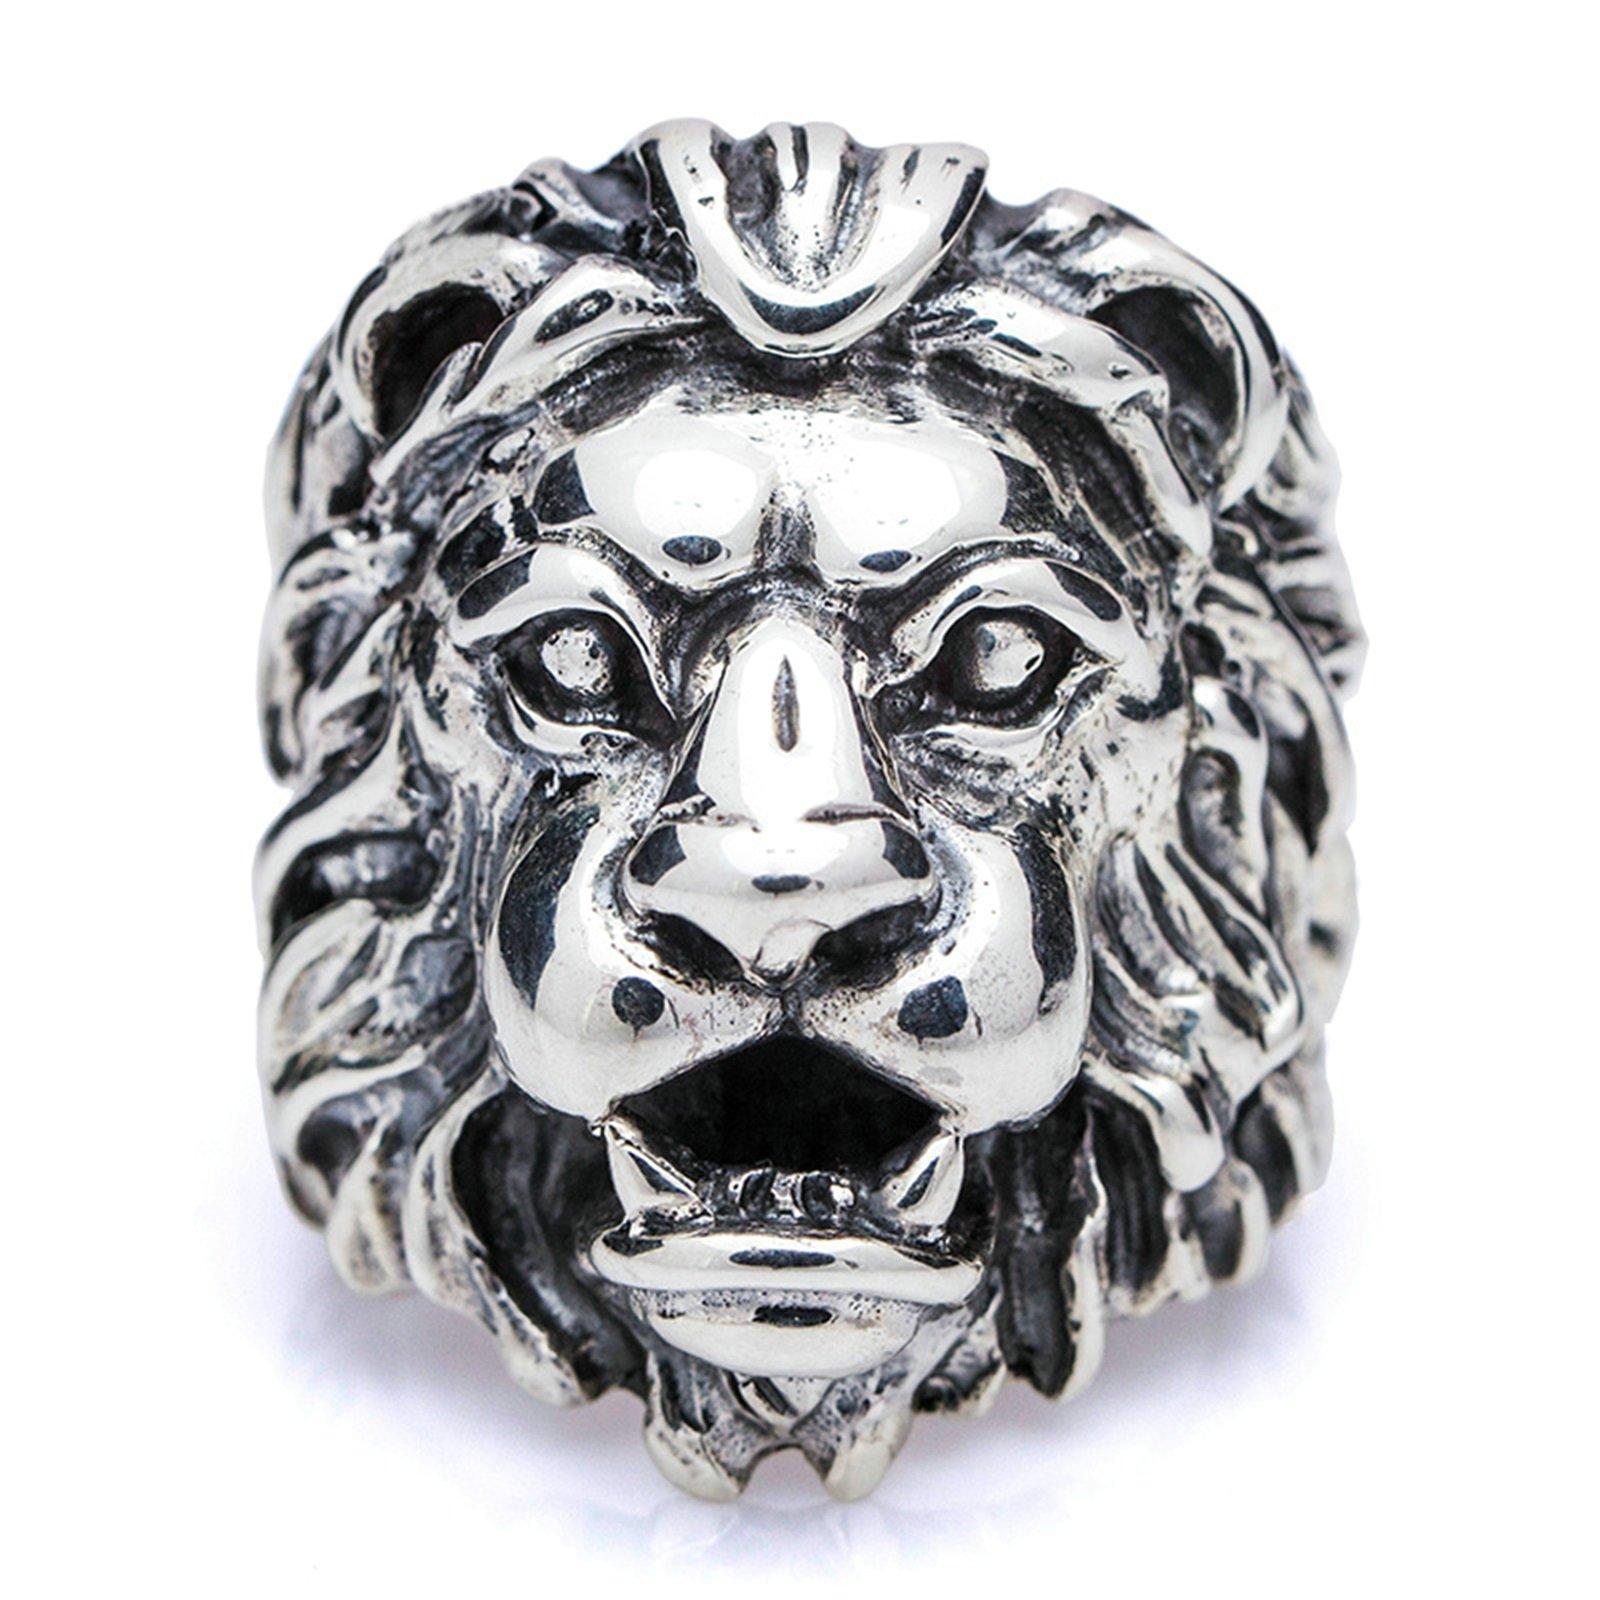 Adisaer Biker Rings Silver Ring for Men Vintage Lion King Head Ring Size 10.5 Vintage Punk Jewelry